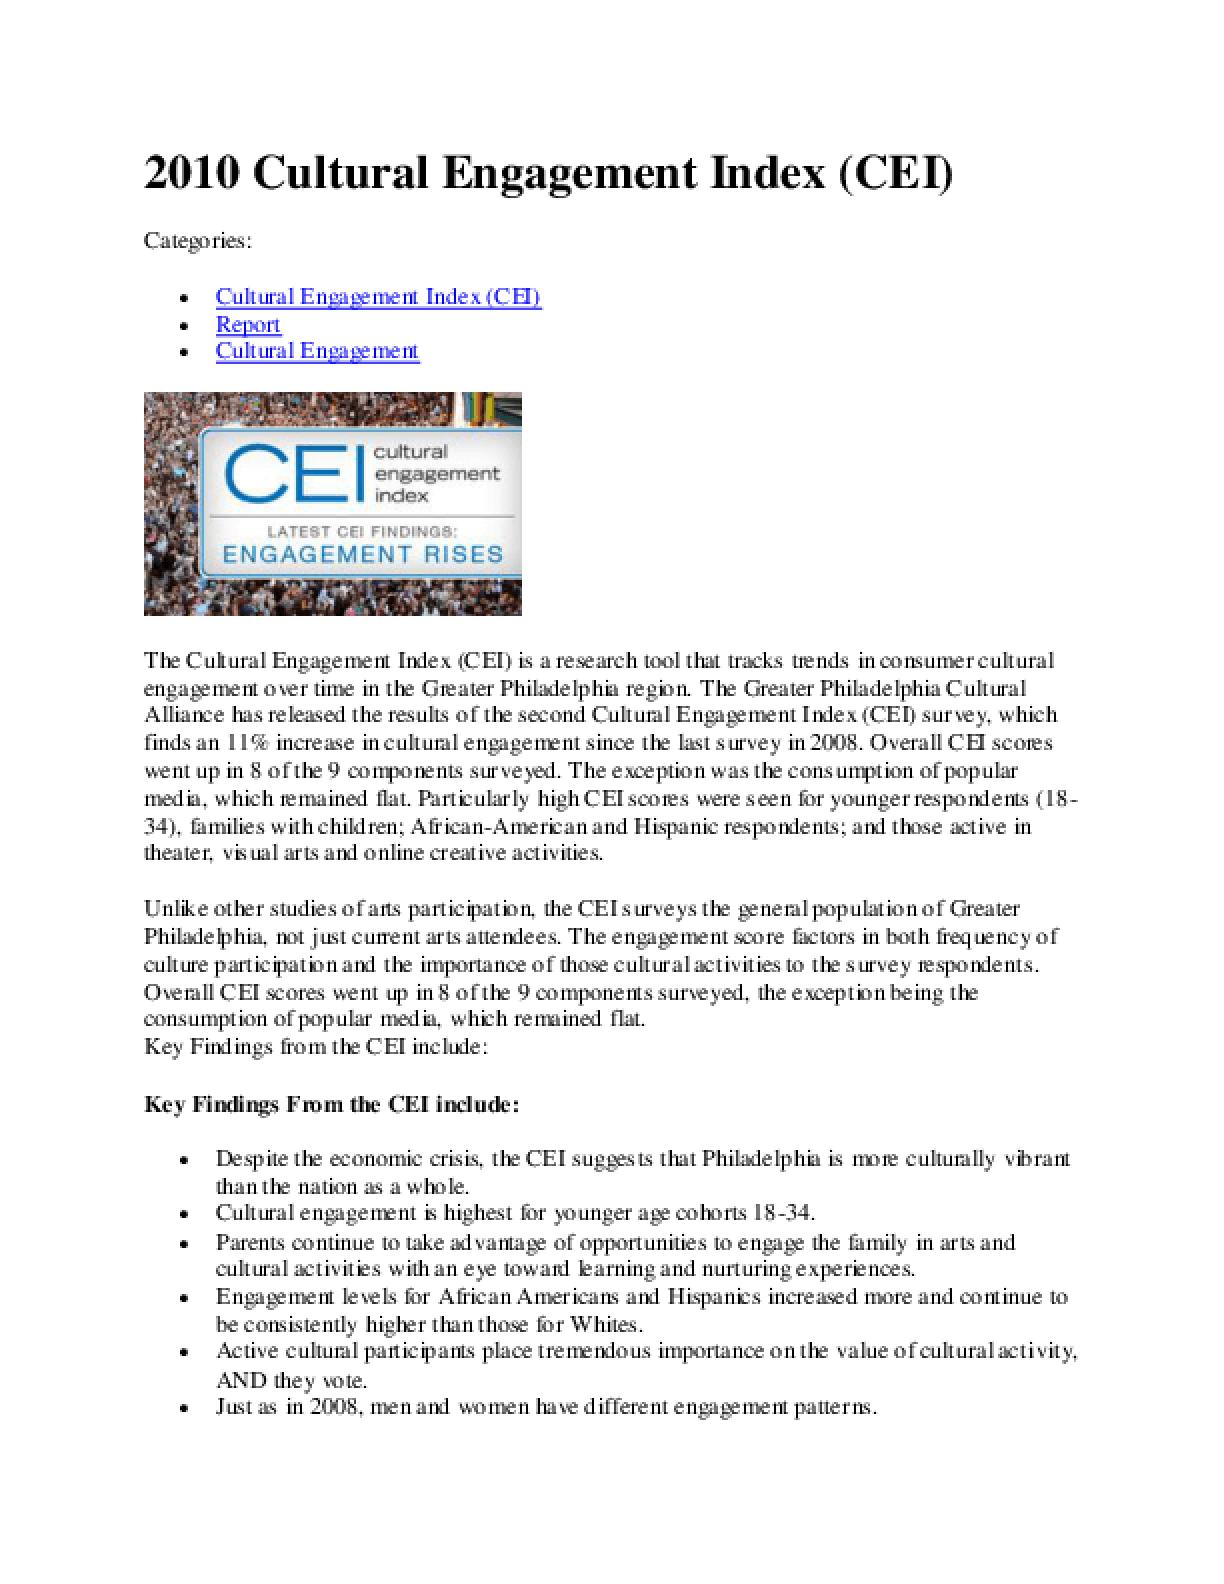 CEI2010: Philadelphia Cultural Engagement Index